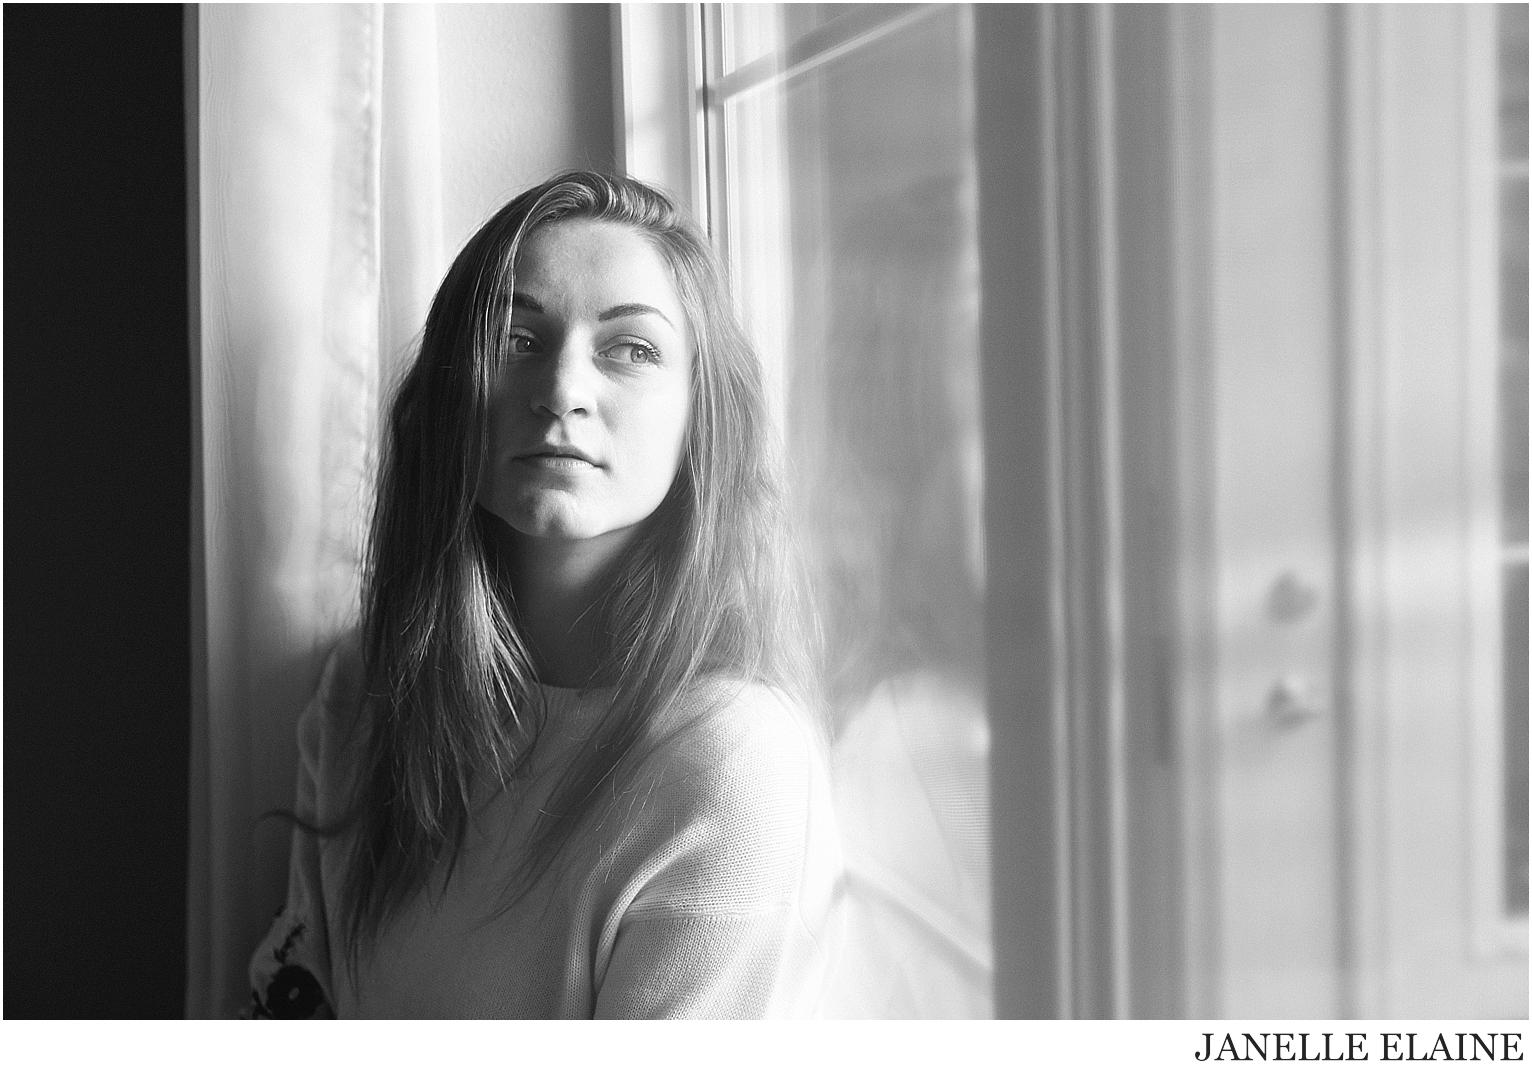 kirsi-seattle-wa-portrait photography-janelle elaine photography-71.jpg